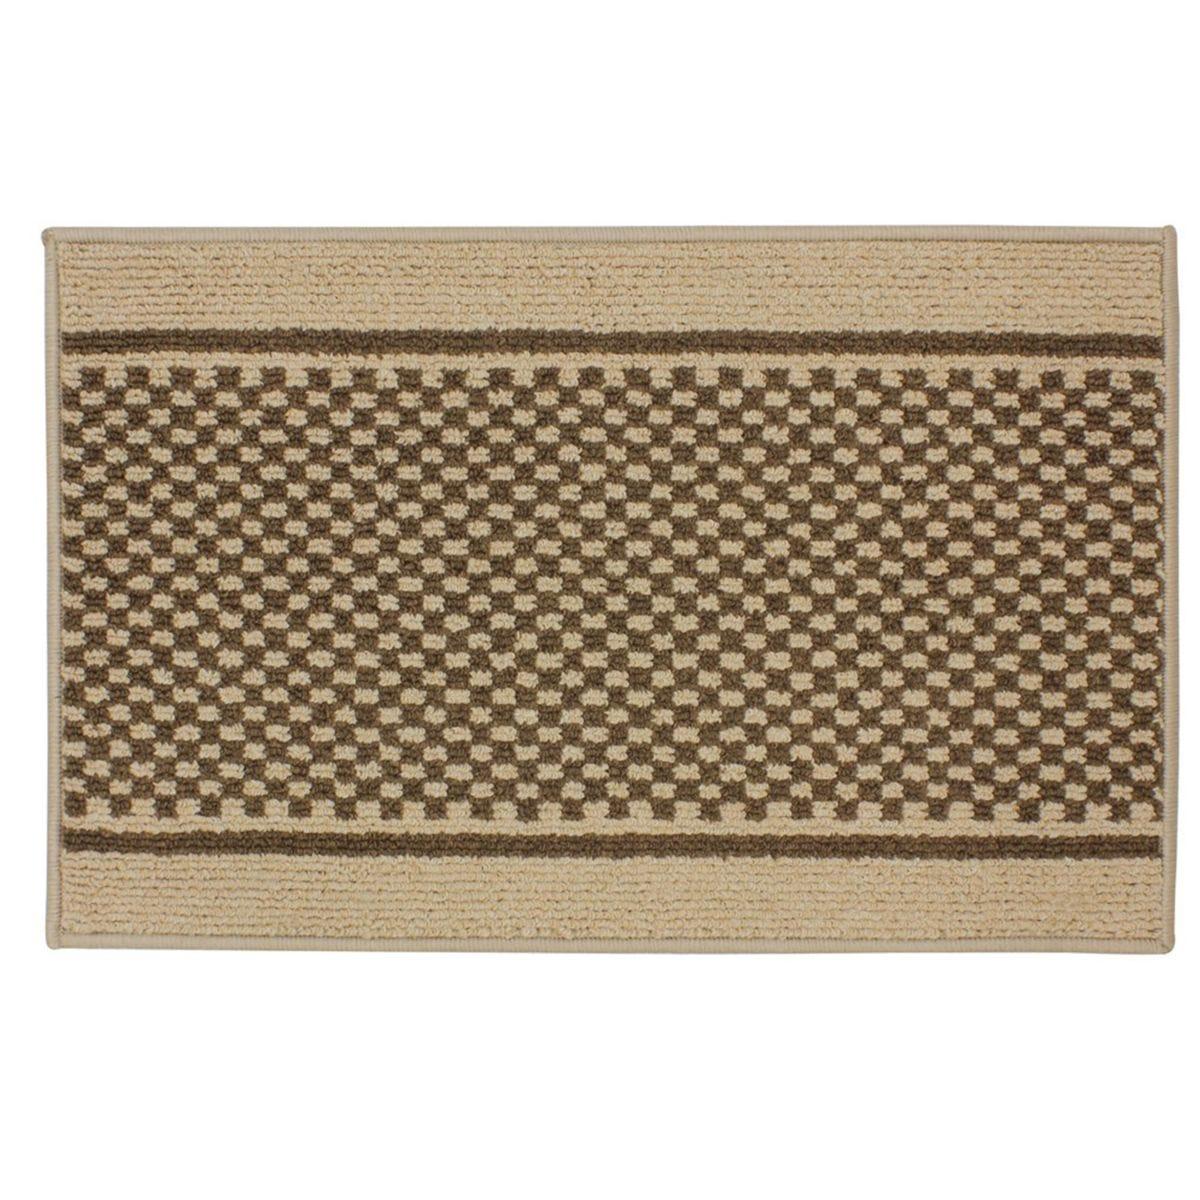 JVL 50x80cm Bologna Entrance Doormat - Beige/Brown